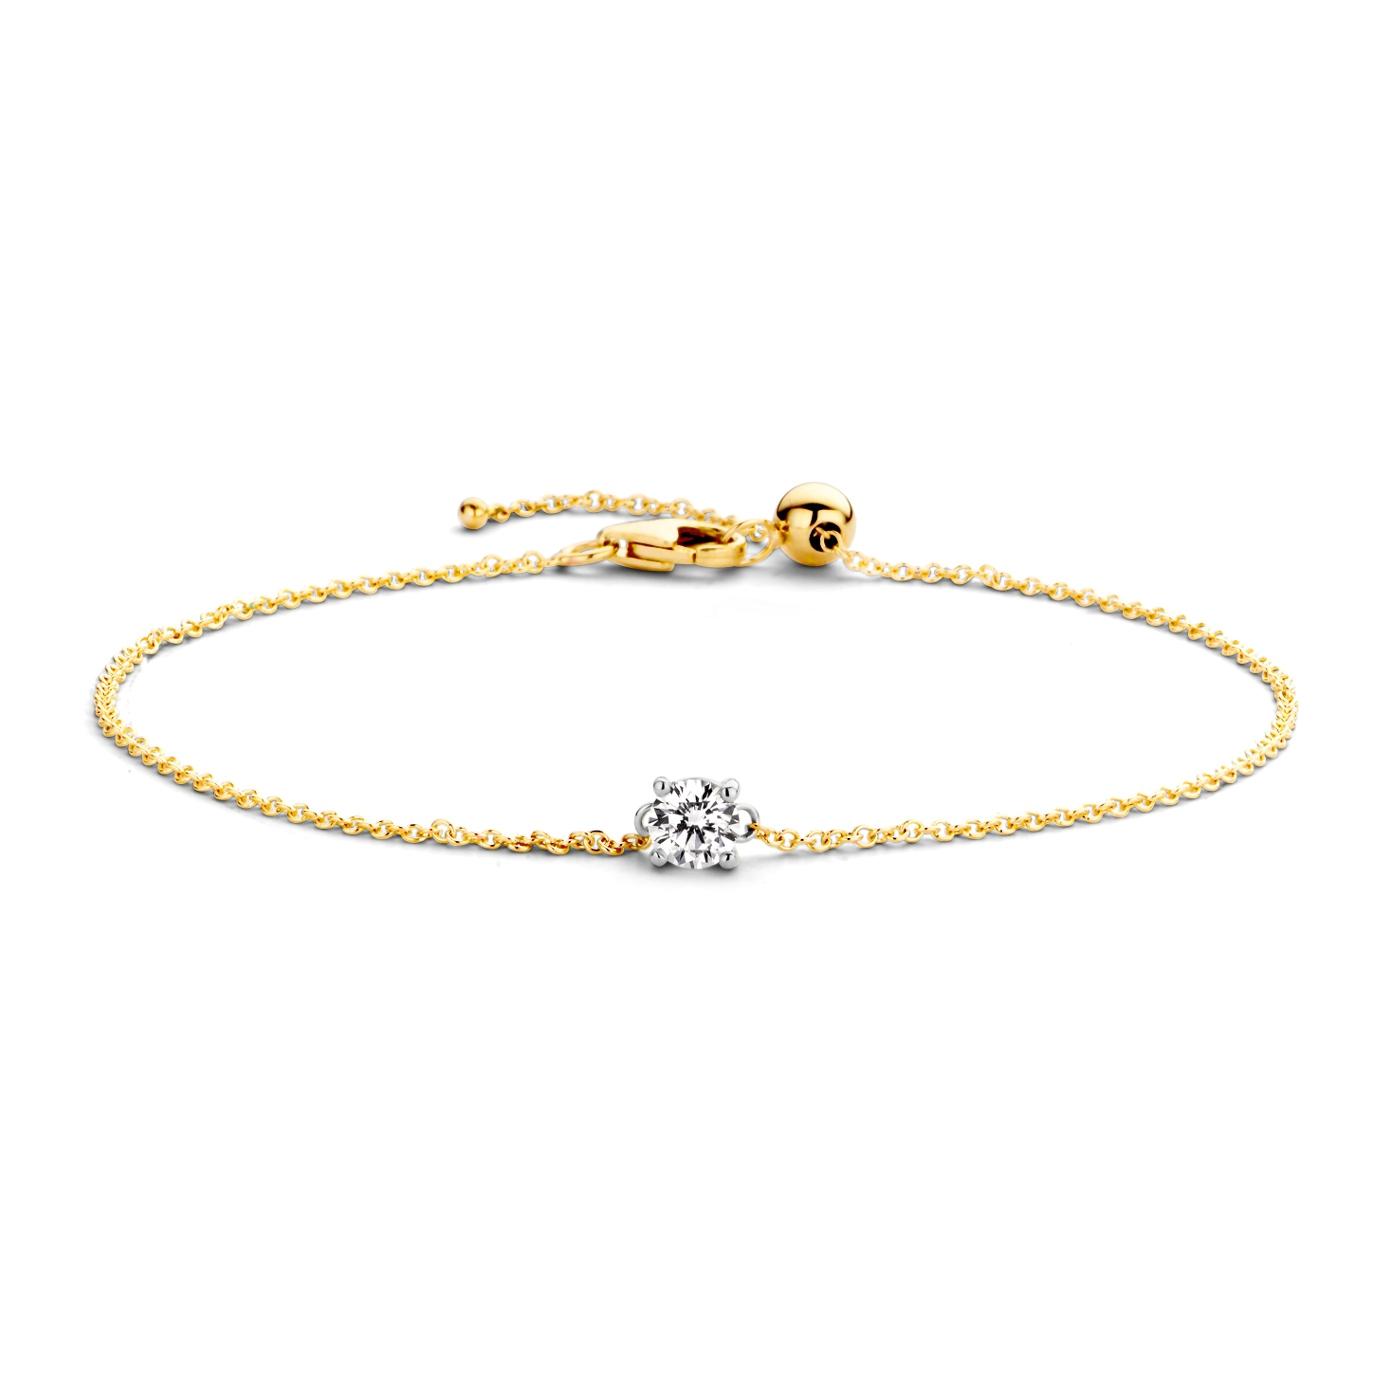 Afbeelding van Blush 14 Karaat Gouden Armband 2166BZI (Lengte: 18.00 cm)